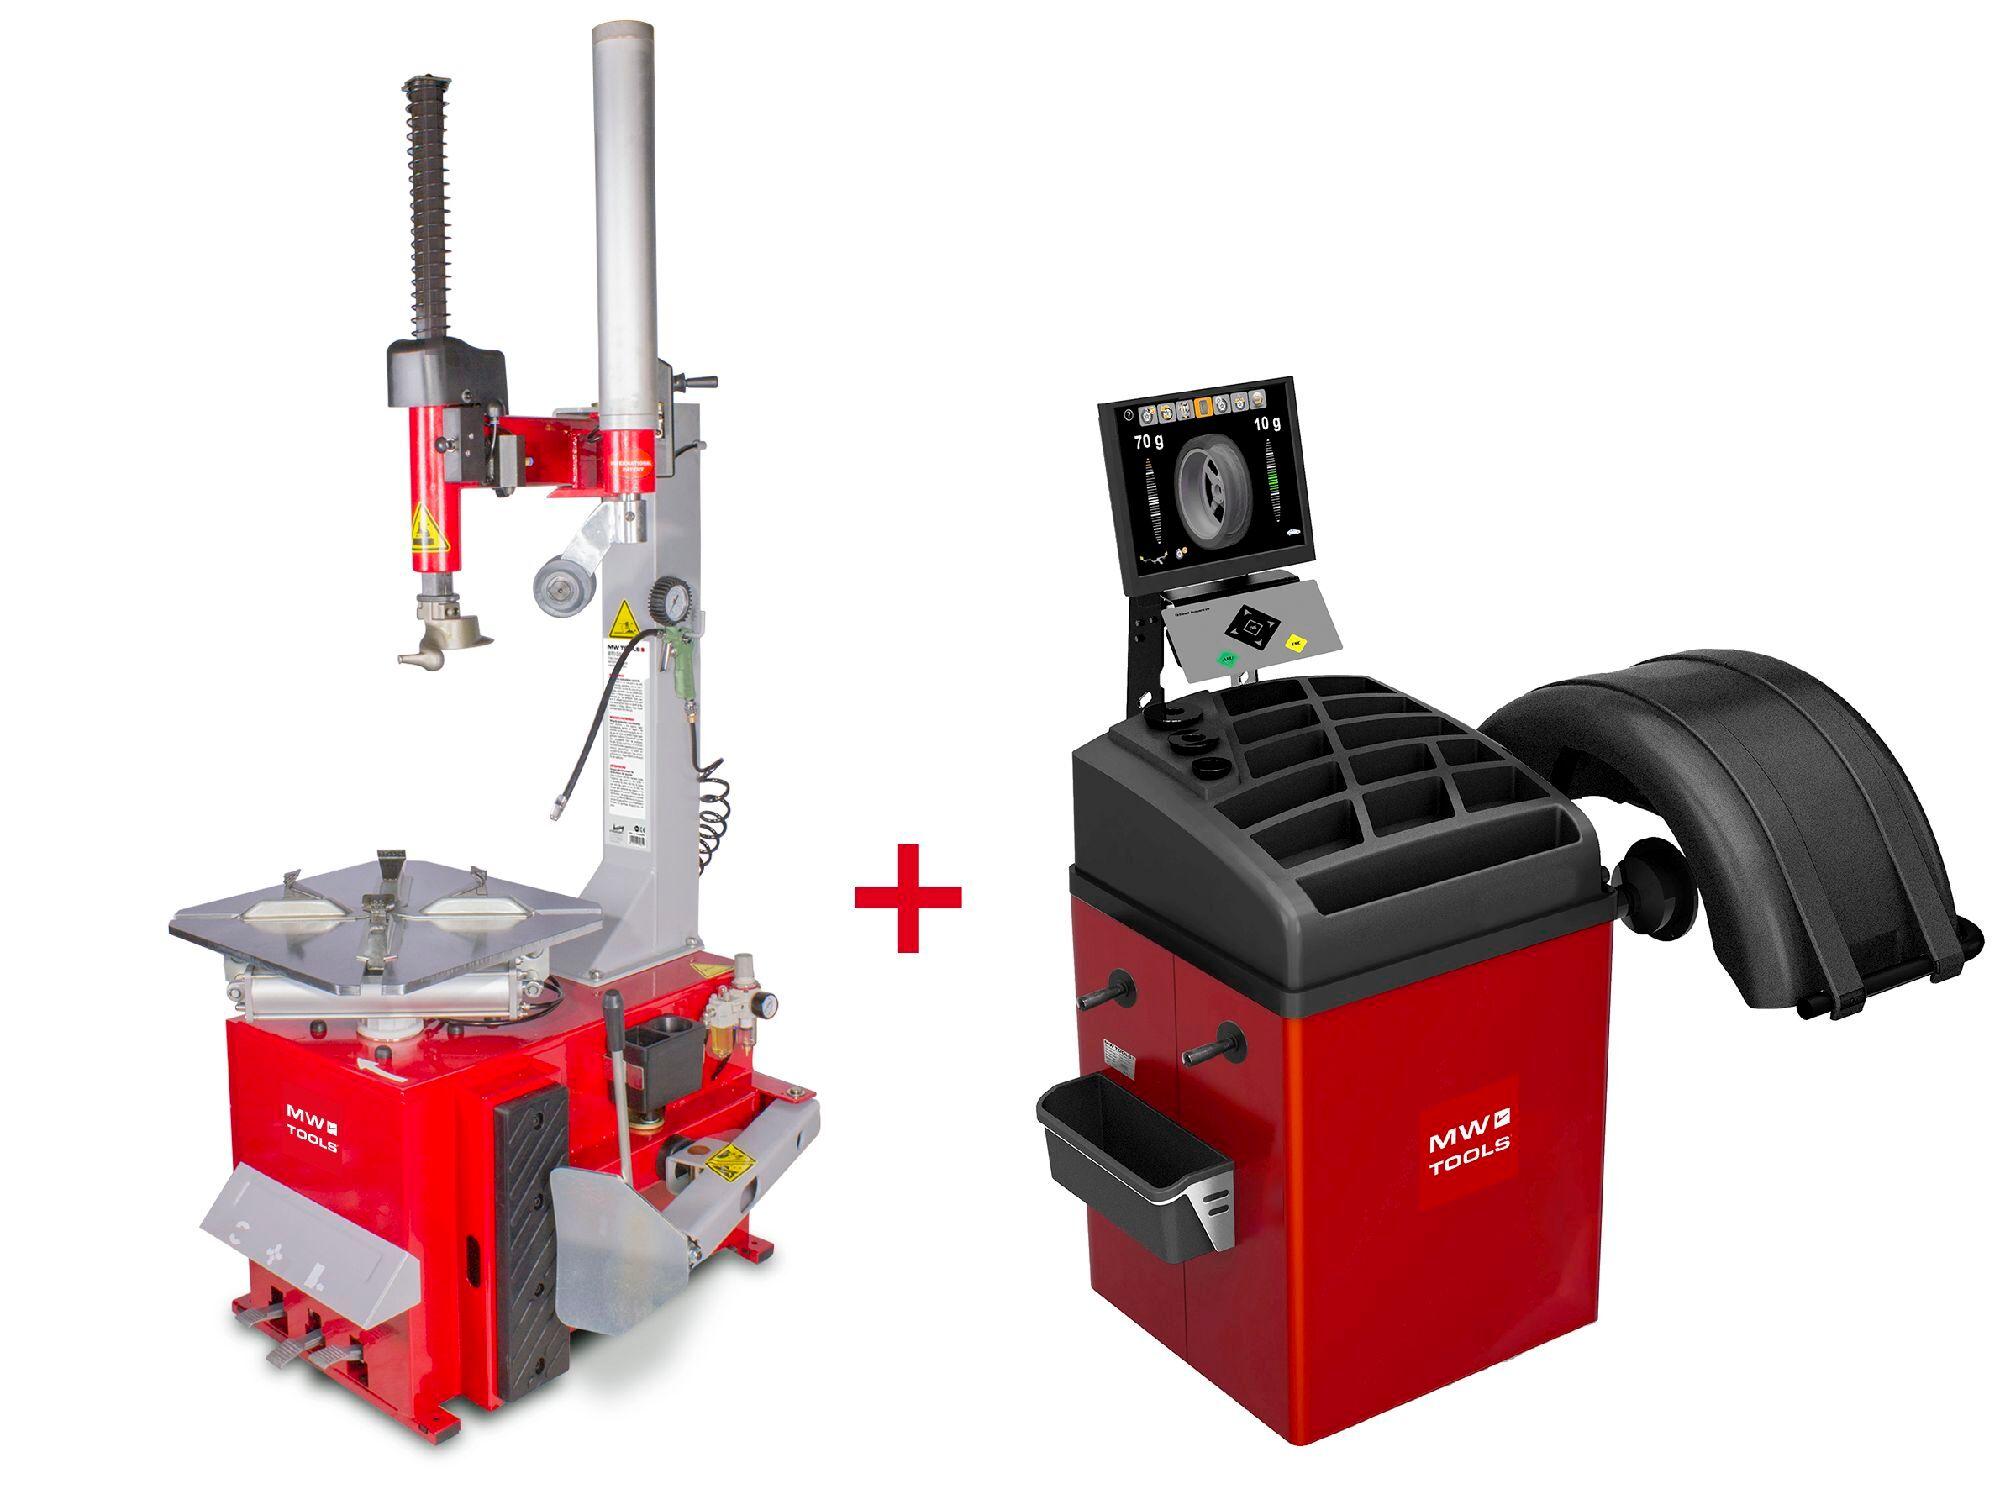 Mw-tools Pack démonte-pneu BT200 3x380V et équilibreuse de roues BB350 220V MW-Tools BT200 SET3